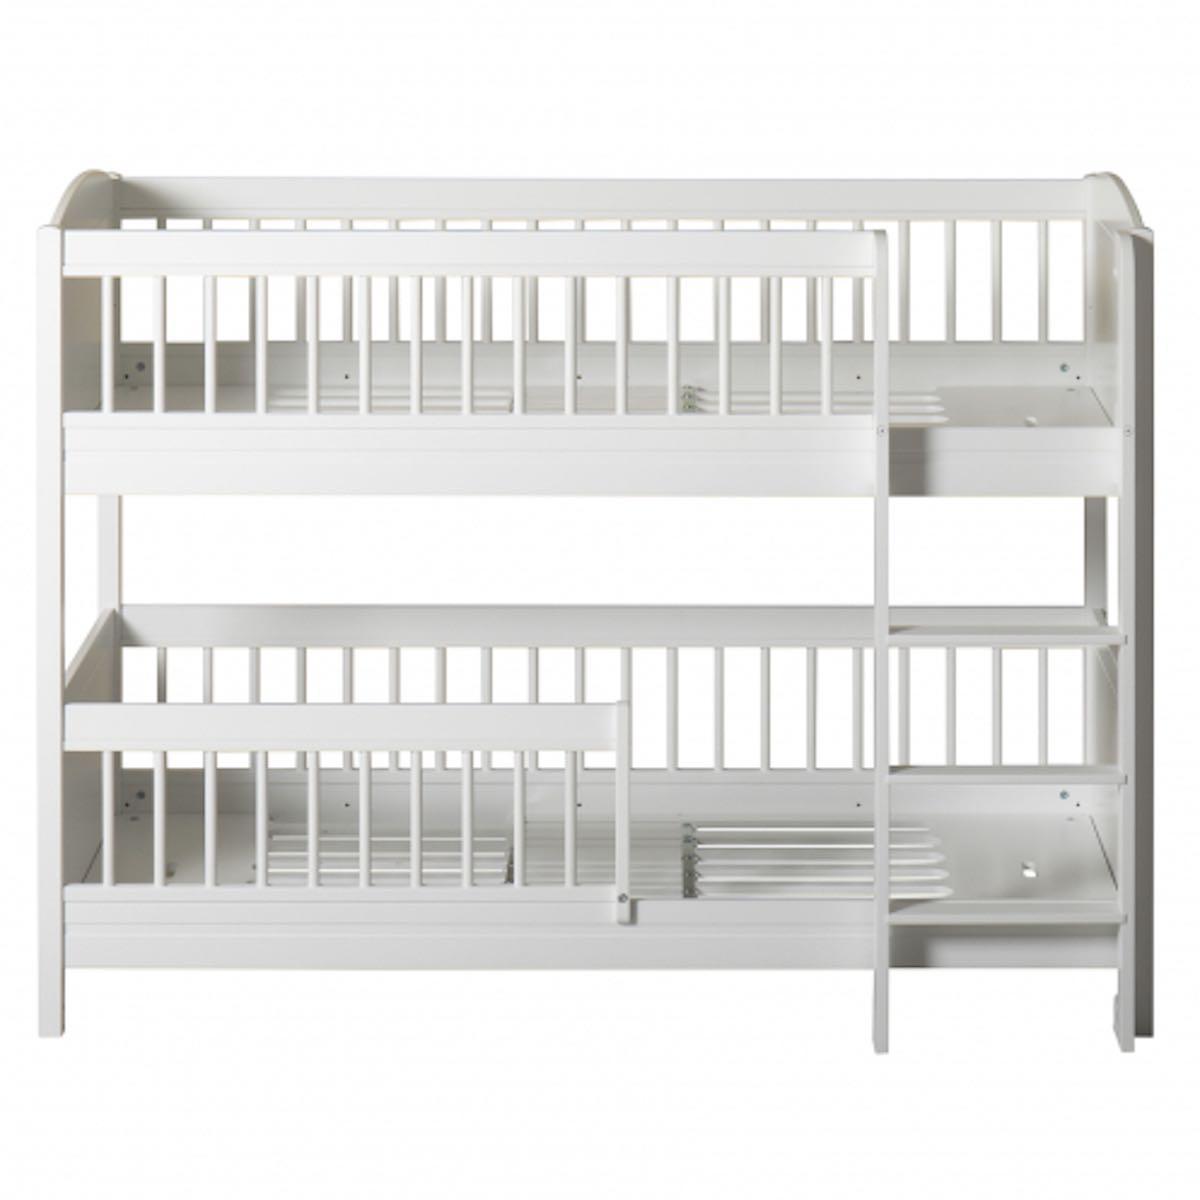 Litera 68x168cm SEASIDE LILLE+ Oliver Furniture blanco